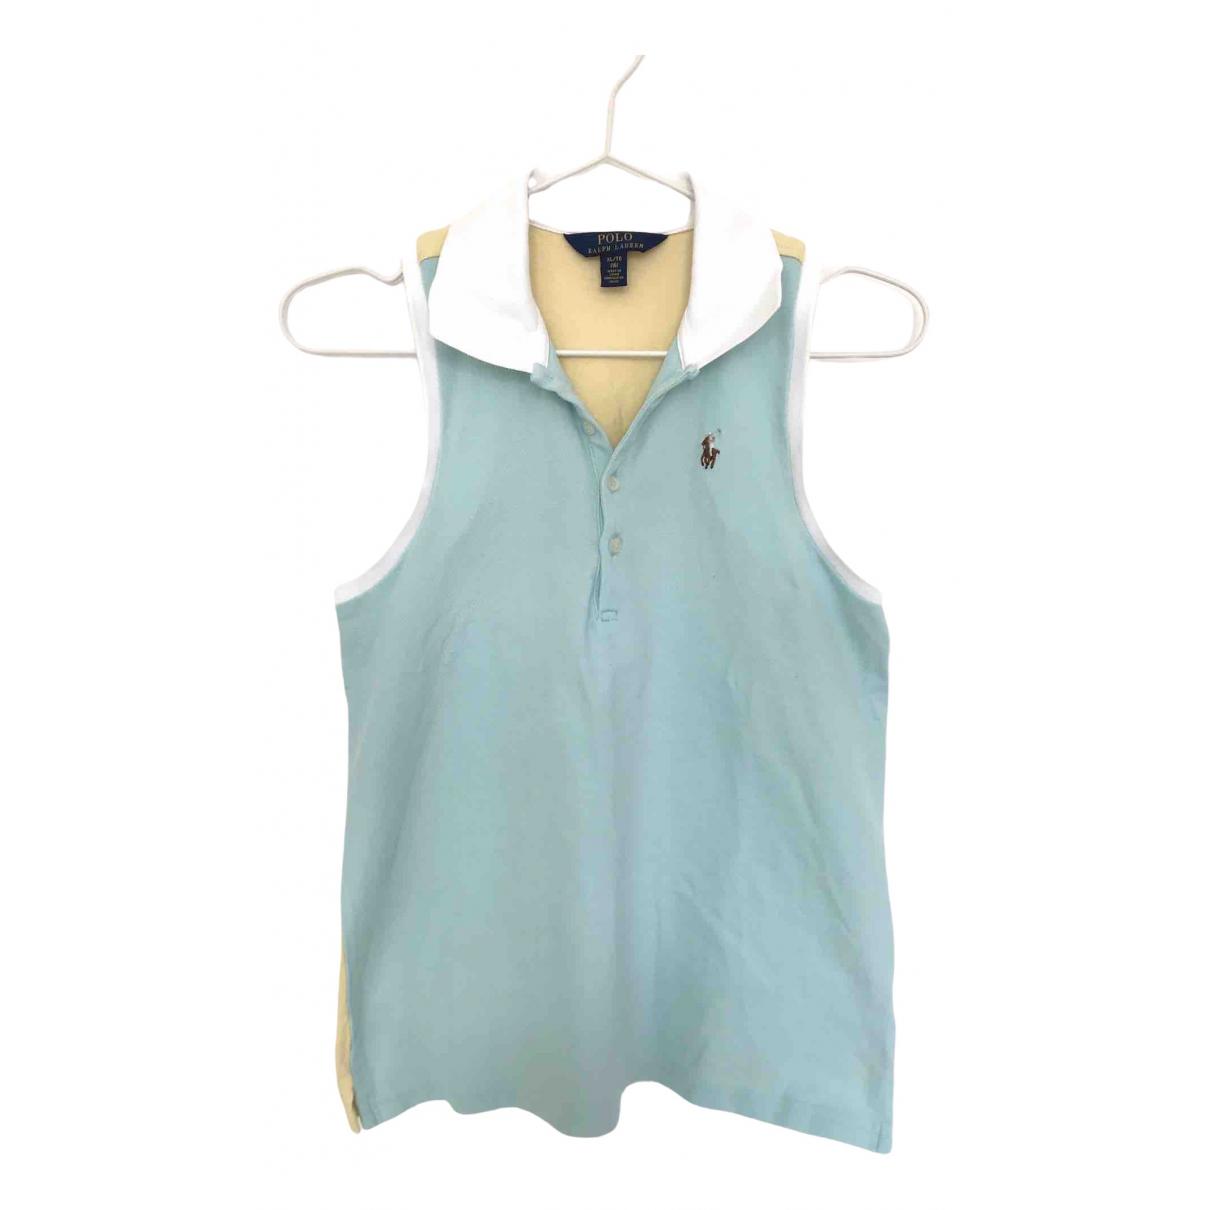 Polo Ralph Lauren N Multicolour Cotton  top for Kids 20 years - XL UK